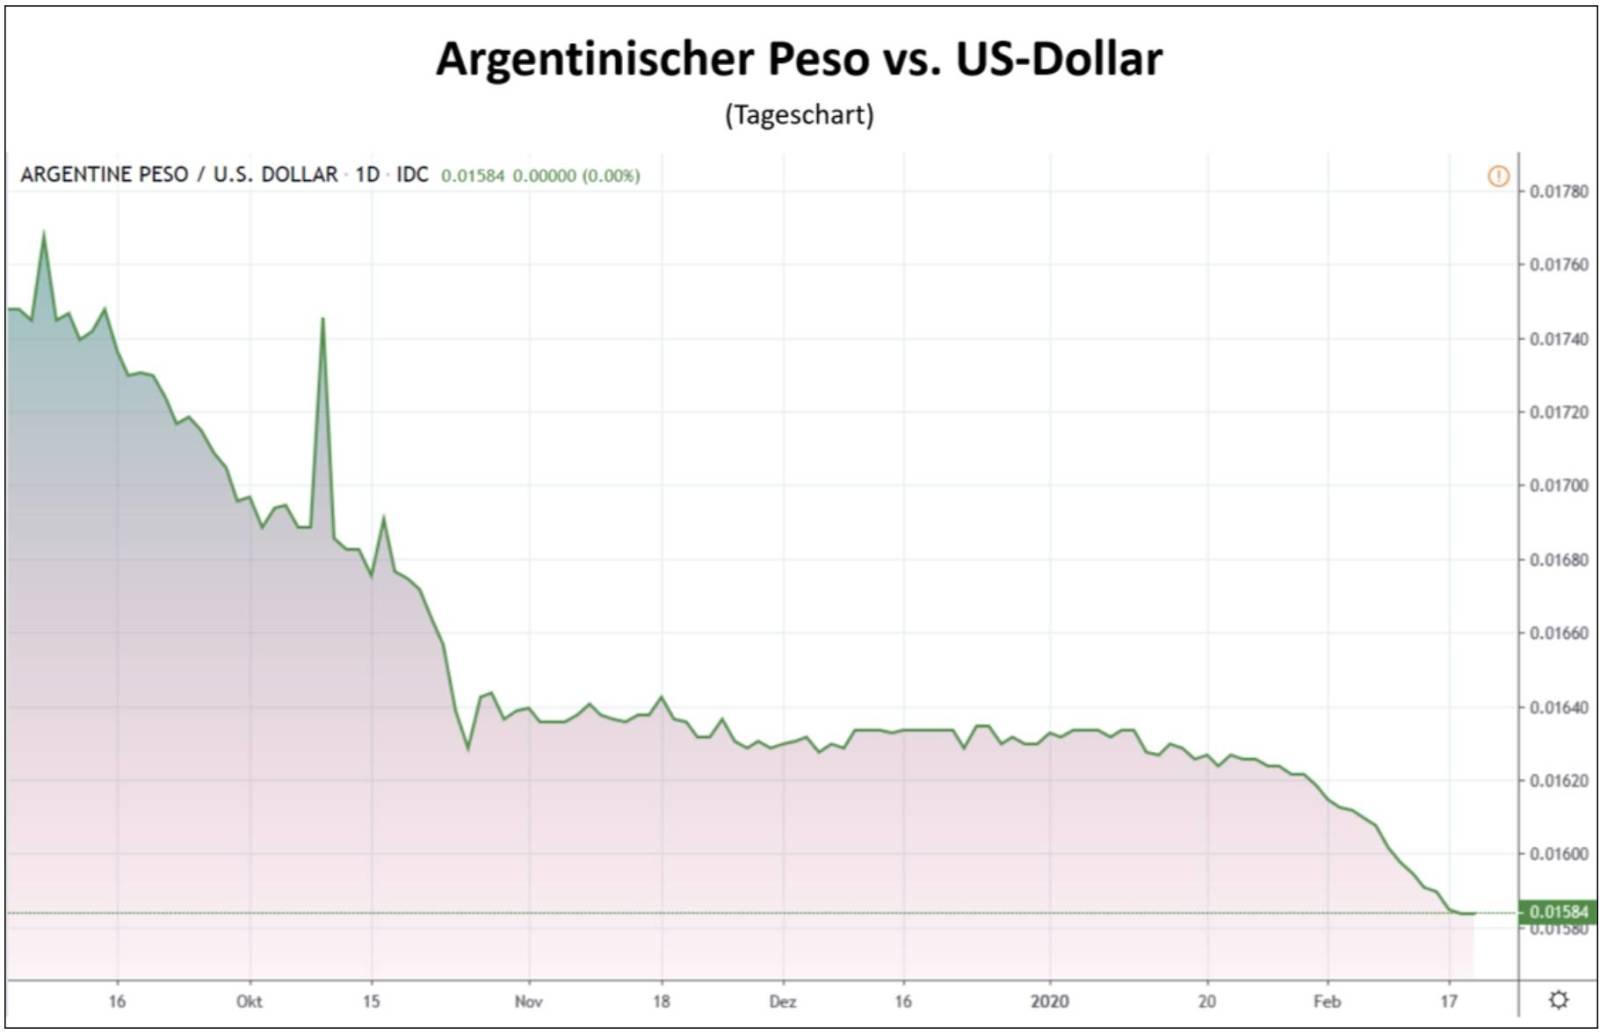 Argentinischer Peso vs US-Dollar